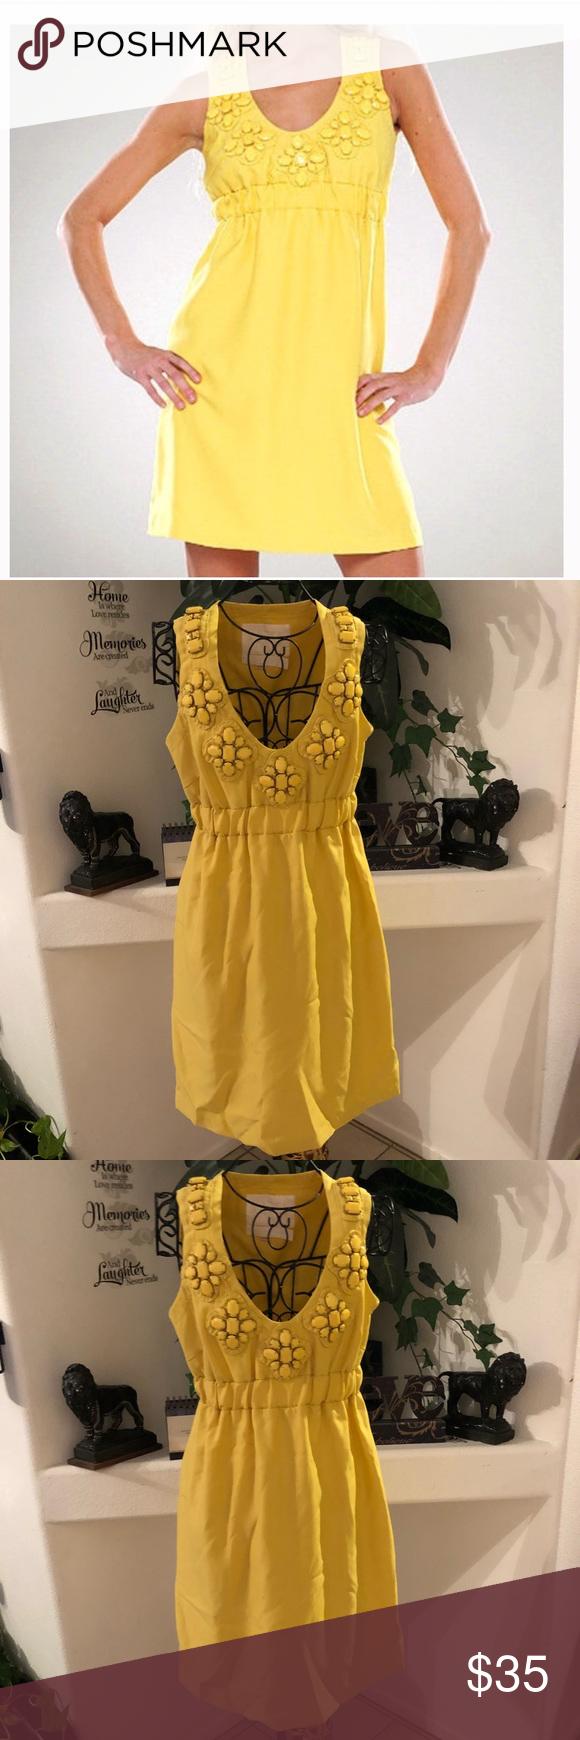 Karta yellow embellished cocktail dress sz small yellow dress